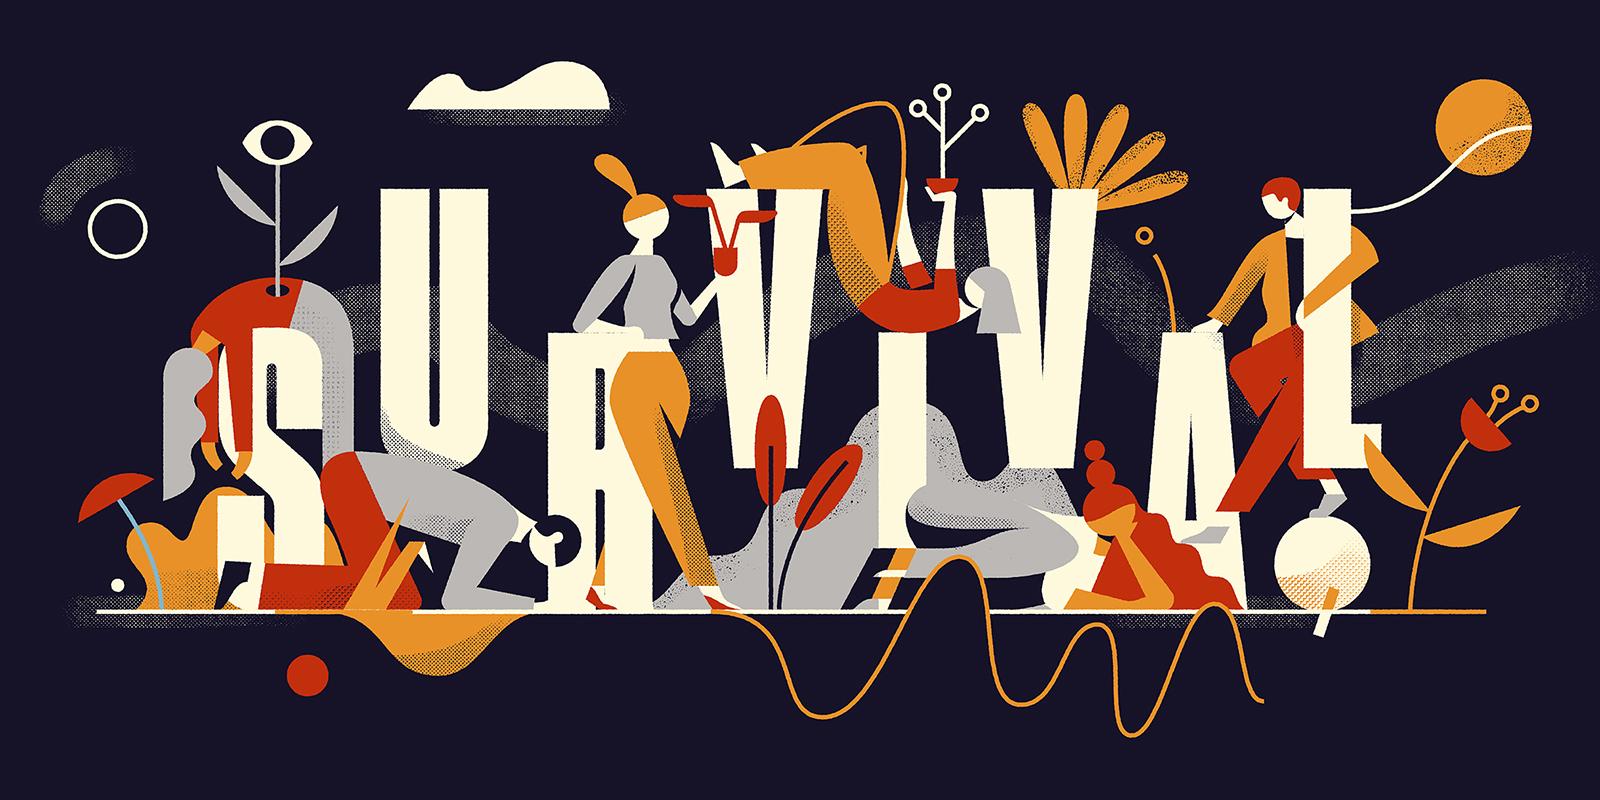 survival-creativemornings-timokuilder-1600.jpg